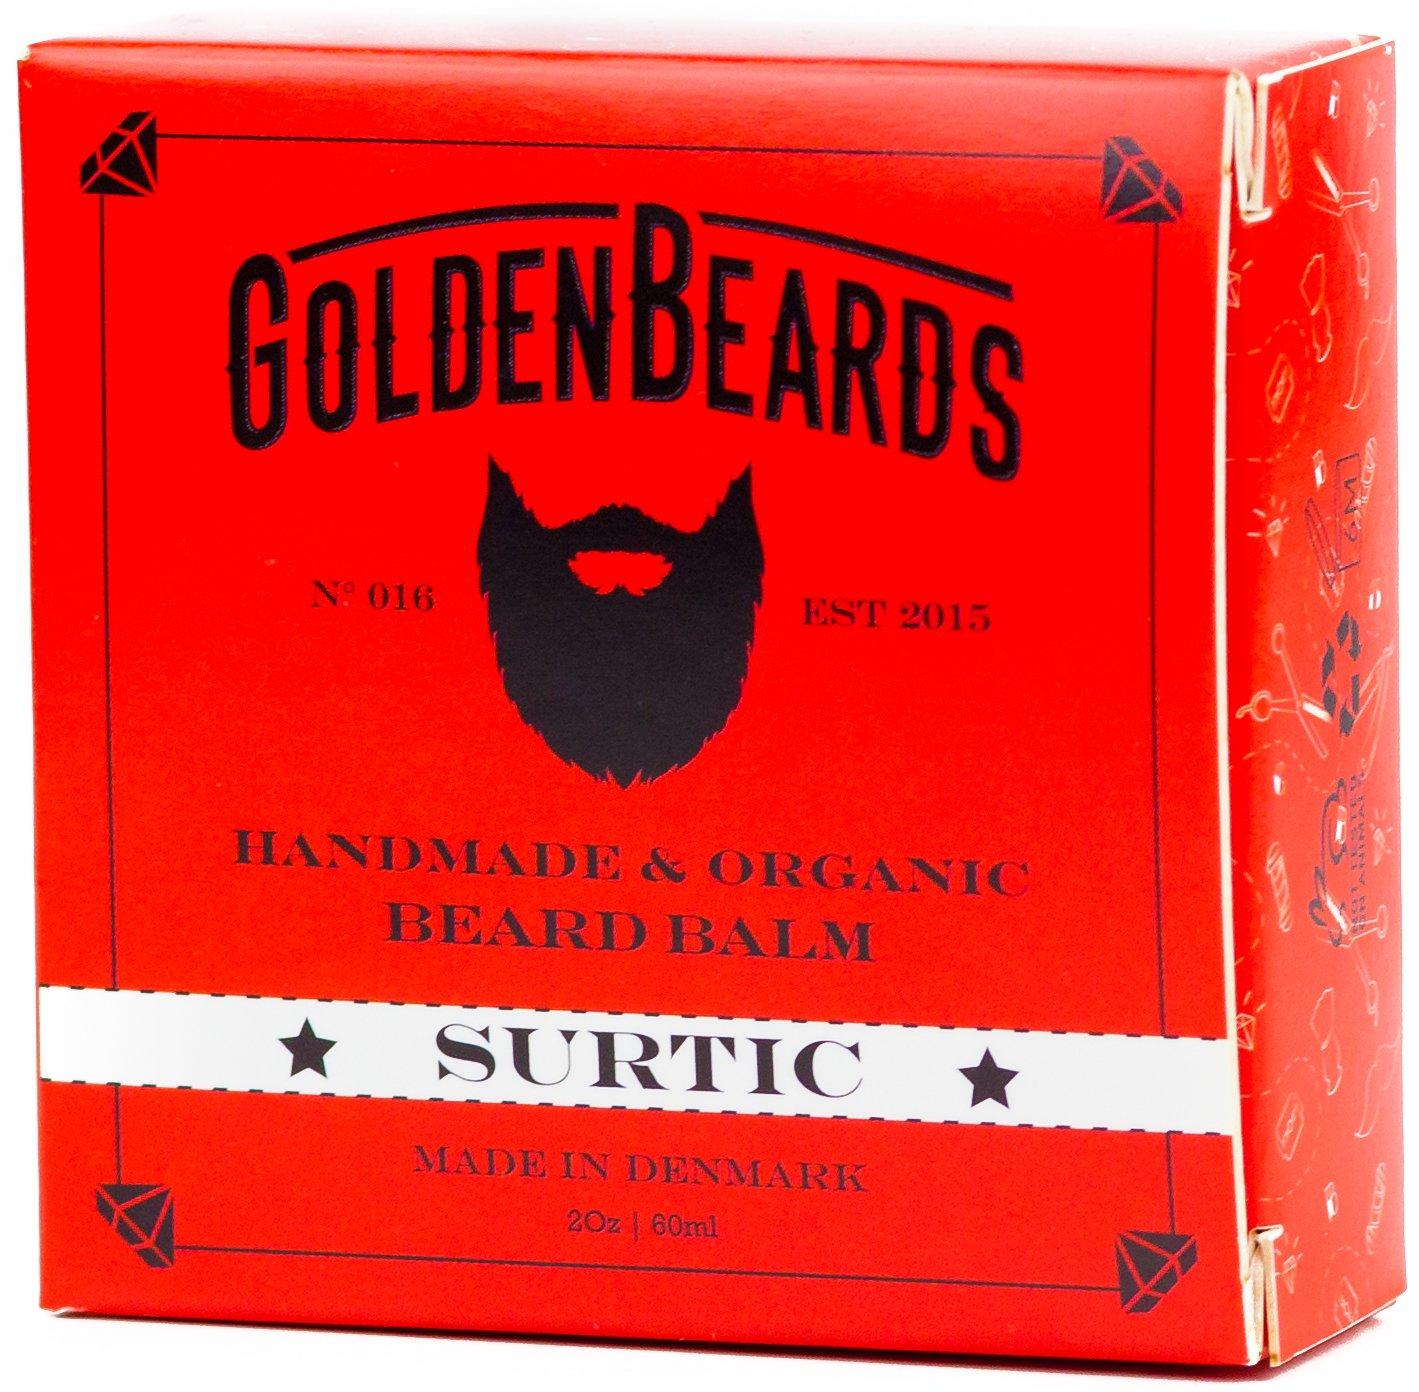 Bio Beard Balm -SURTIC - 60ML - 100% Beard Balm Natural -Golden Beards- We produce Beard Balm Strong Hold - The ideal Beard Balm for men scented and long beards - Get our Premium Beard Balm